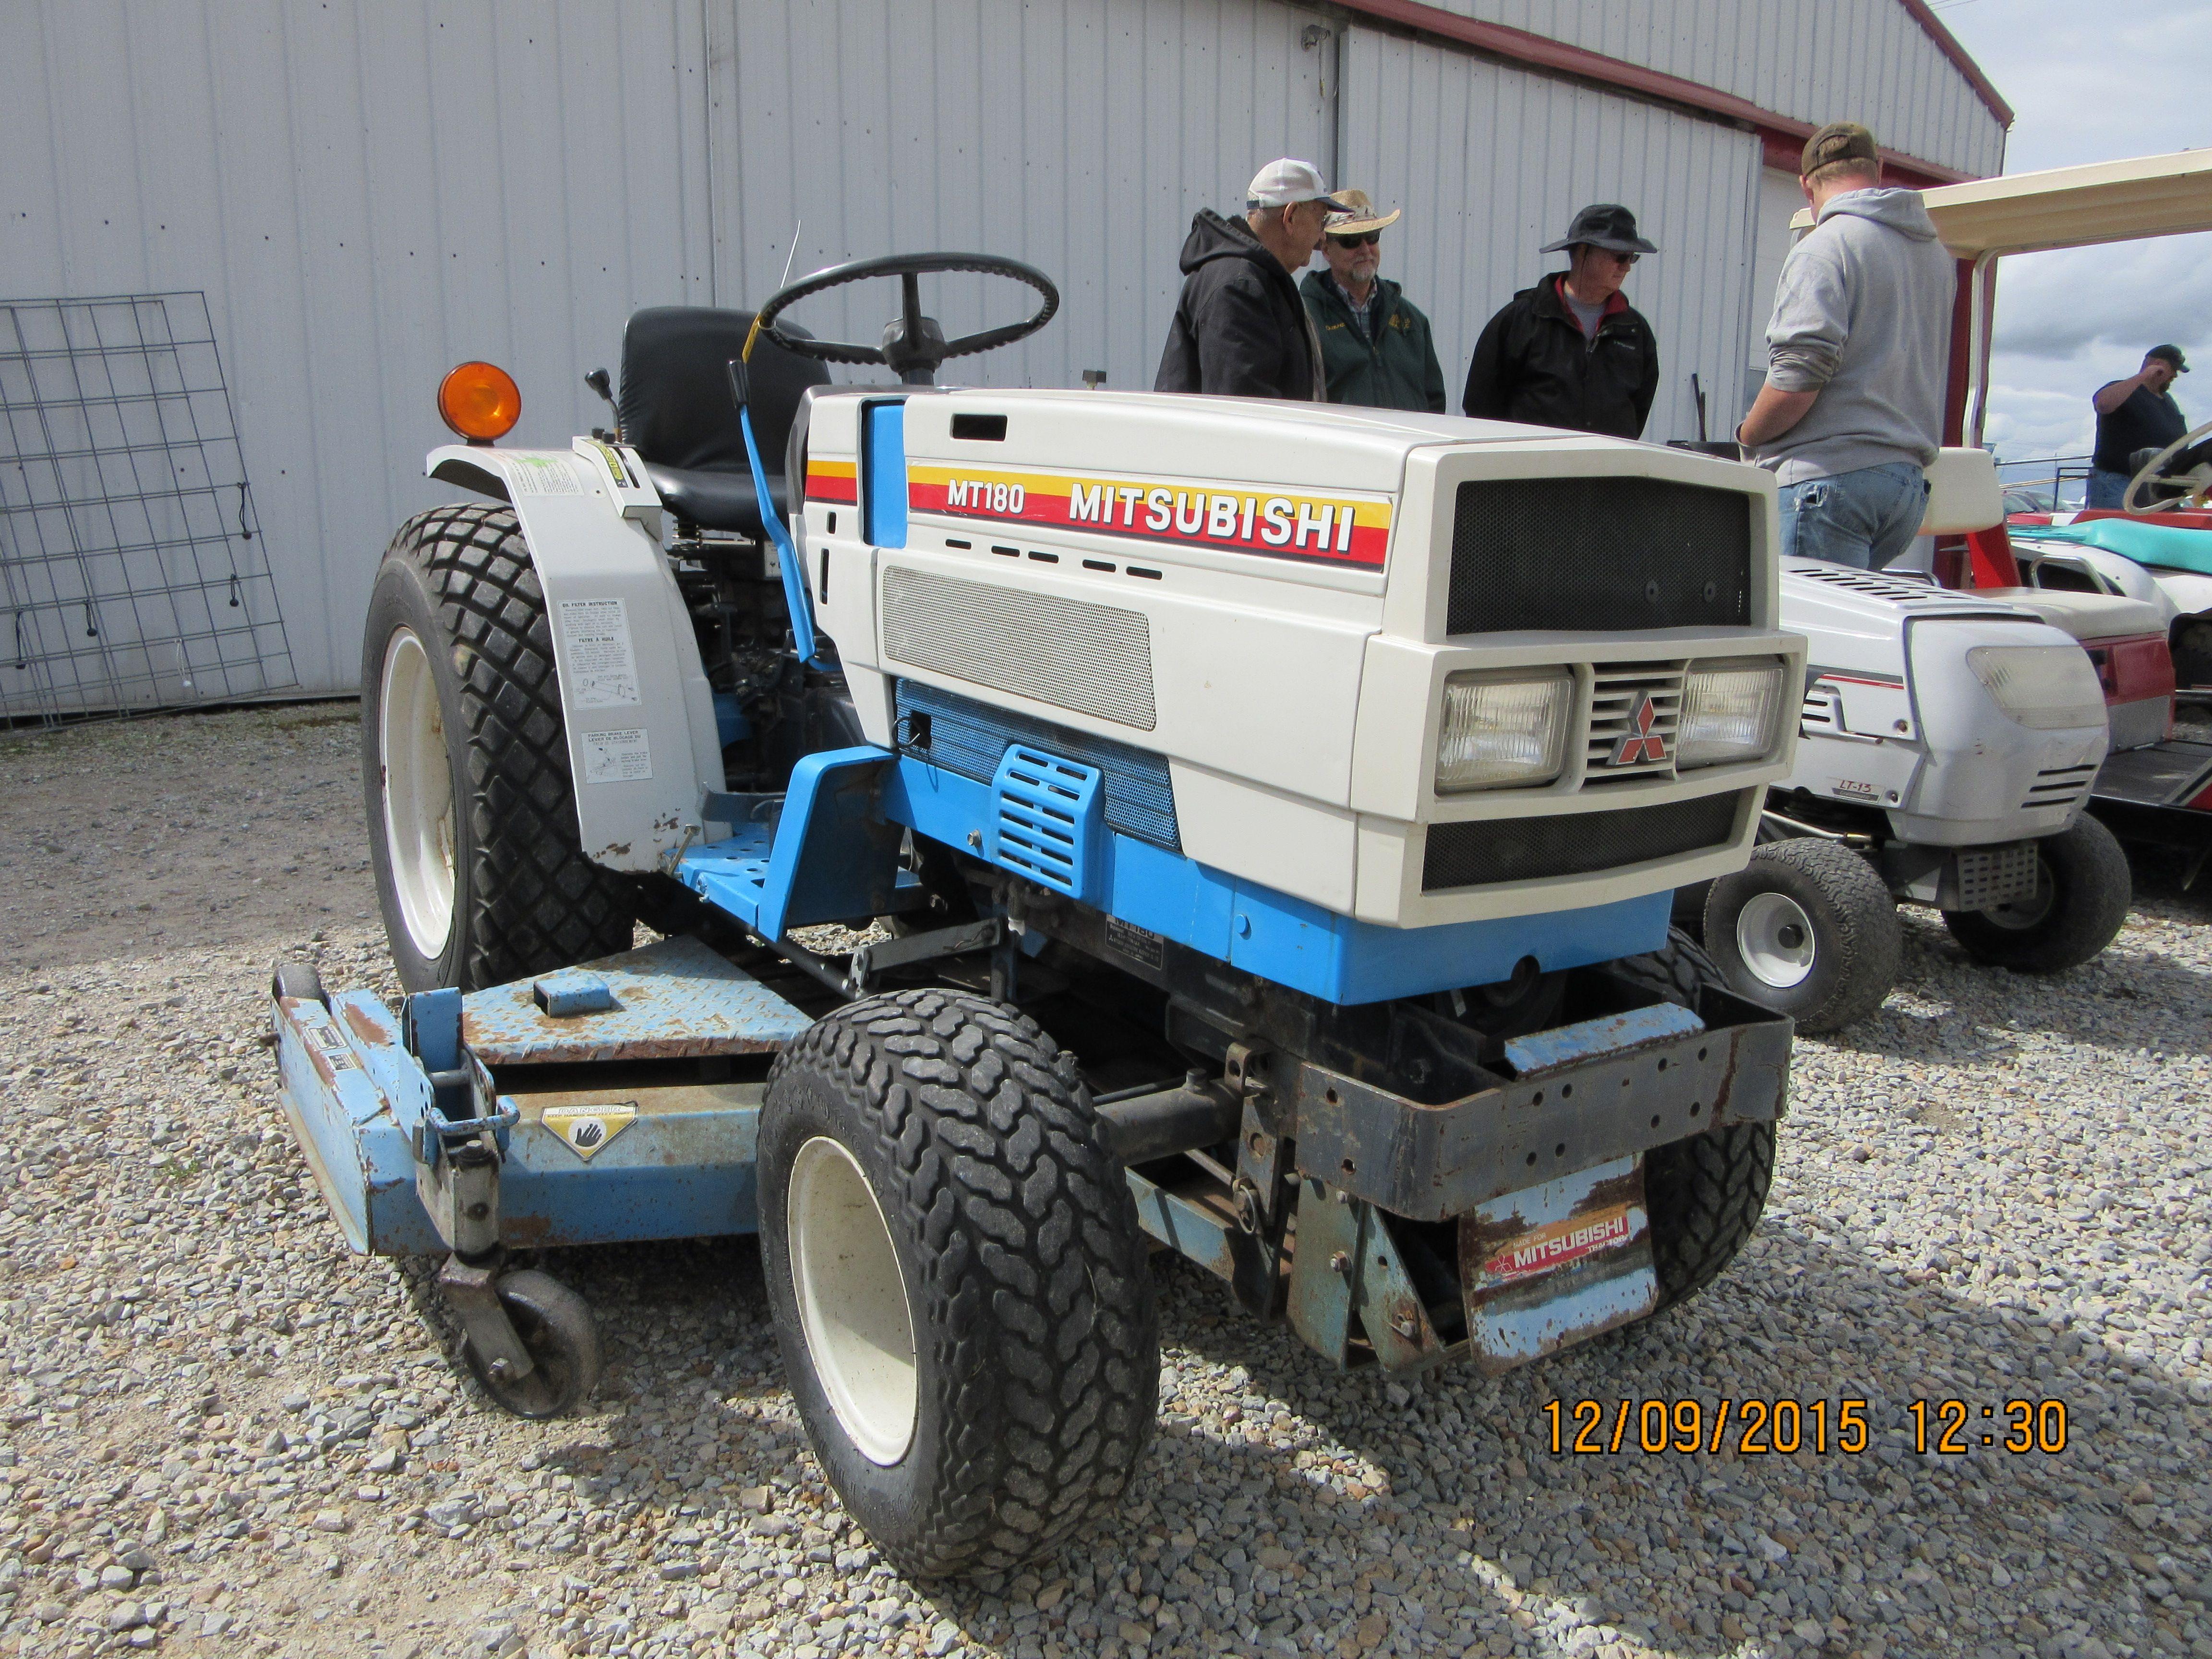 Rare Mitsubishi Mt186 Old Tractors Tractor Pictures Tractors